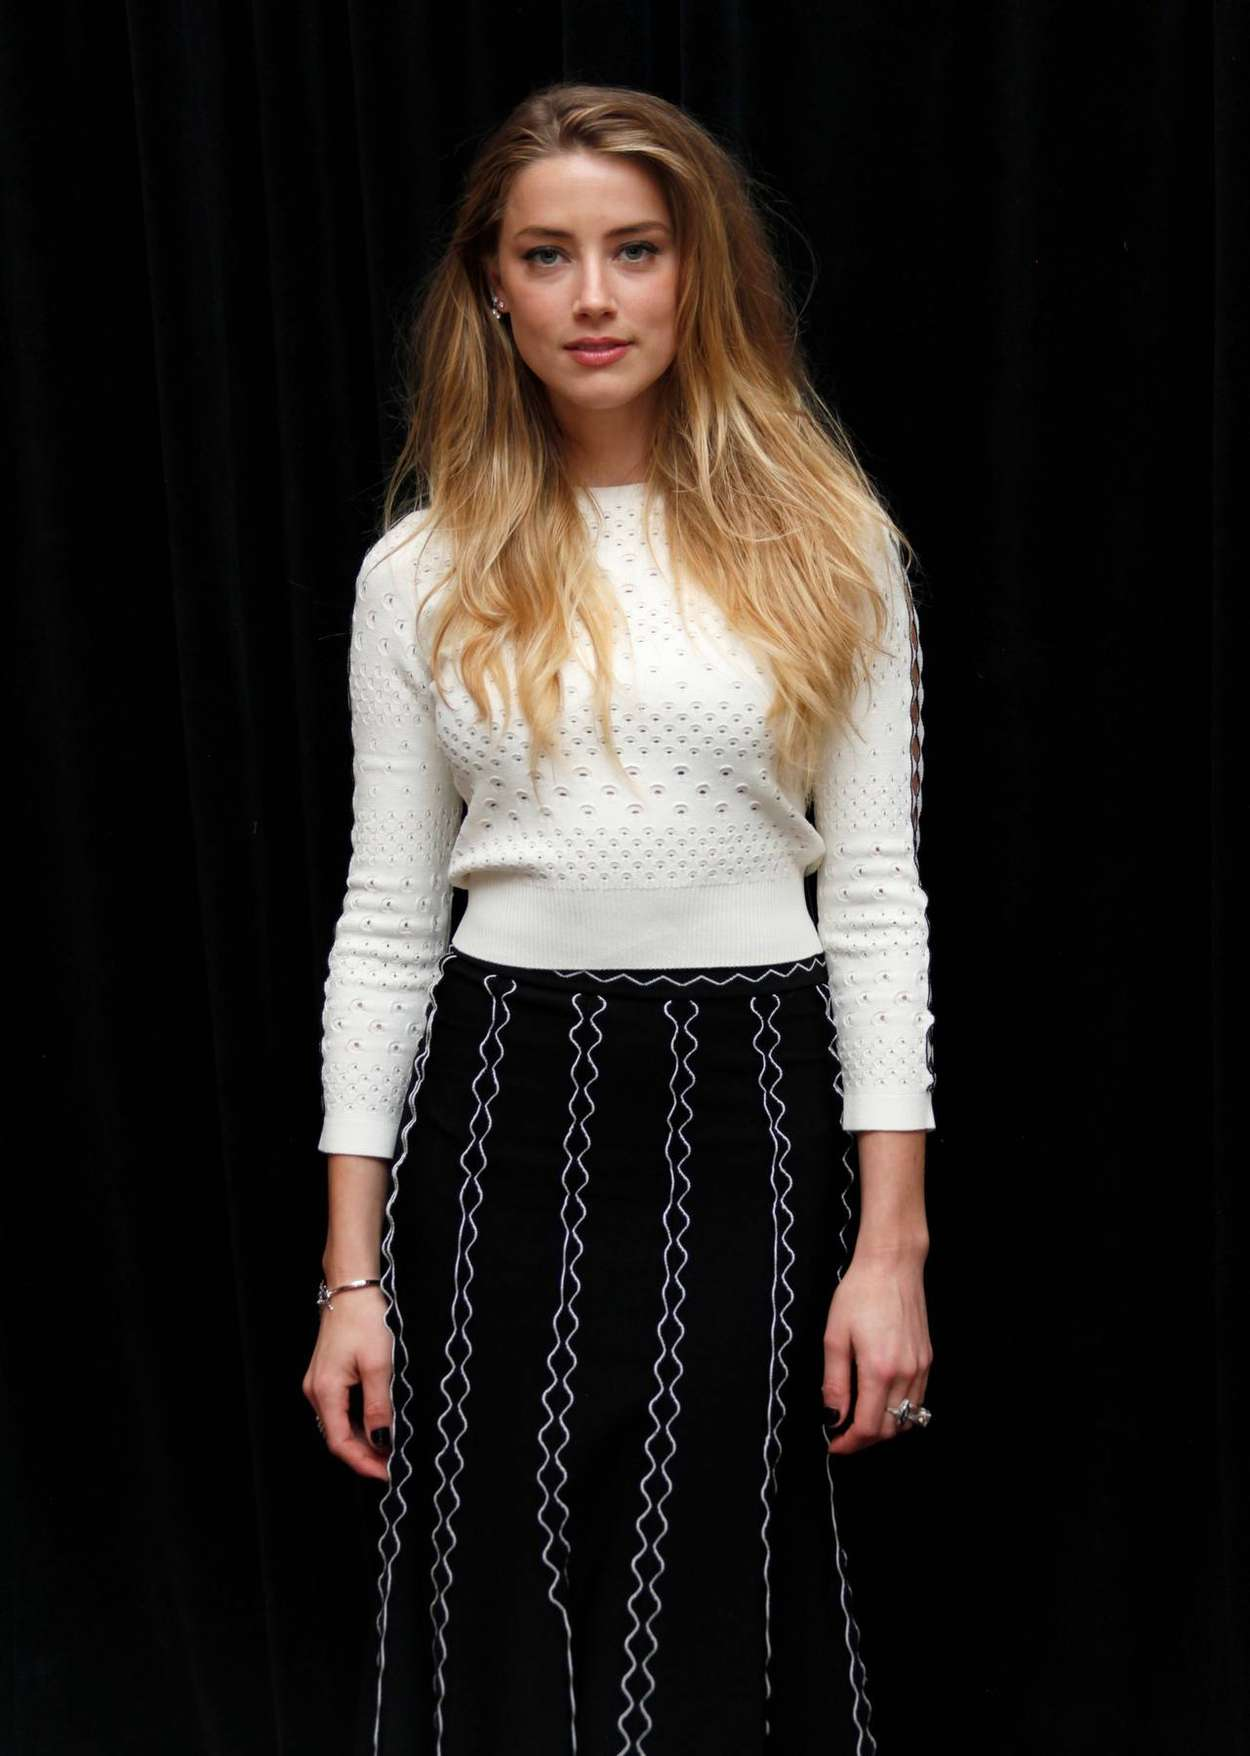 Amber Heard 2015 : Amber Heard: The Danish Girl Photocall -08